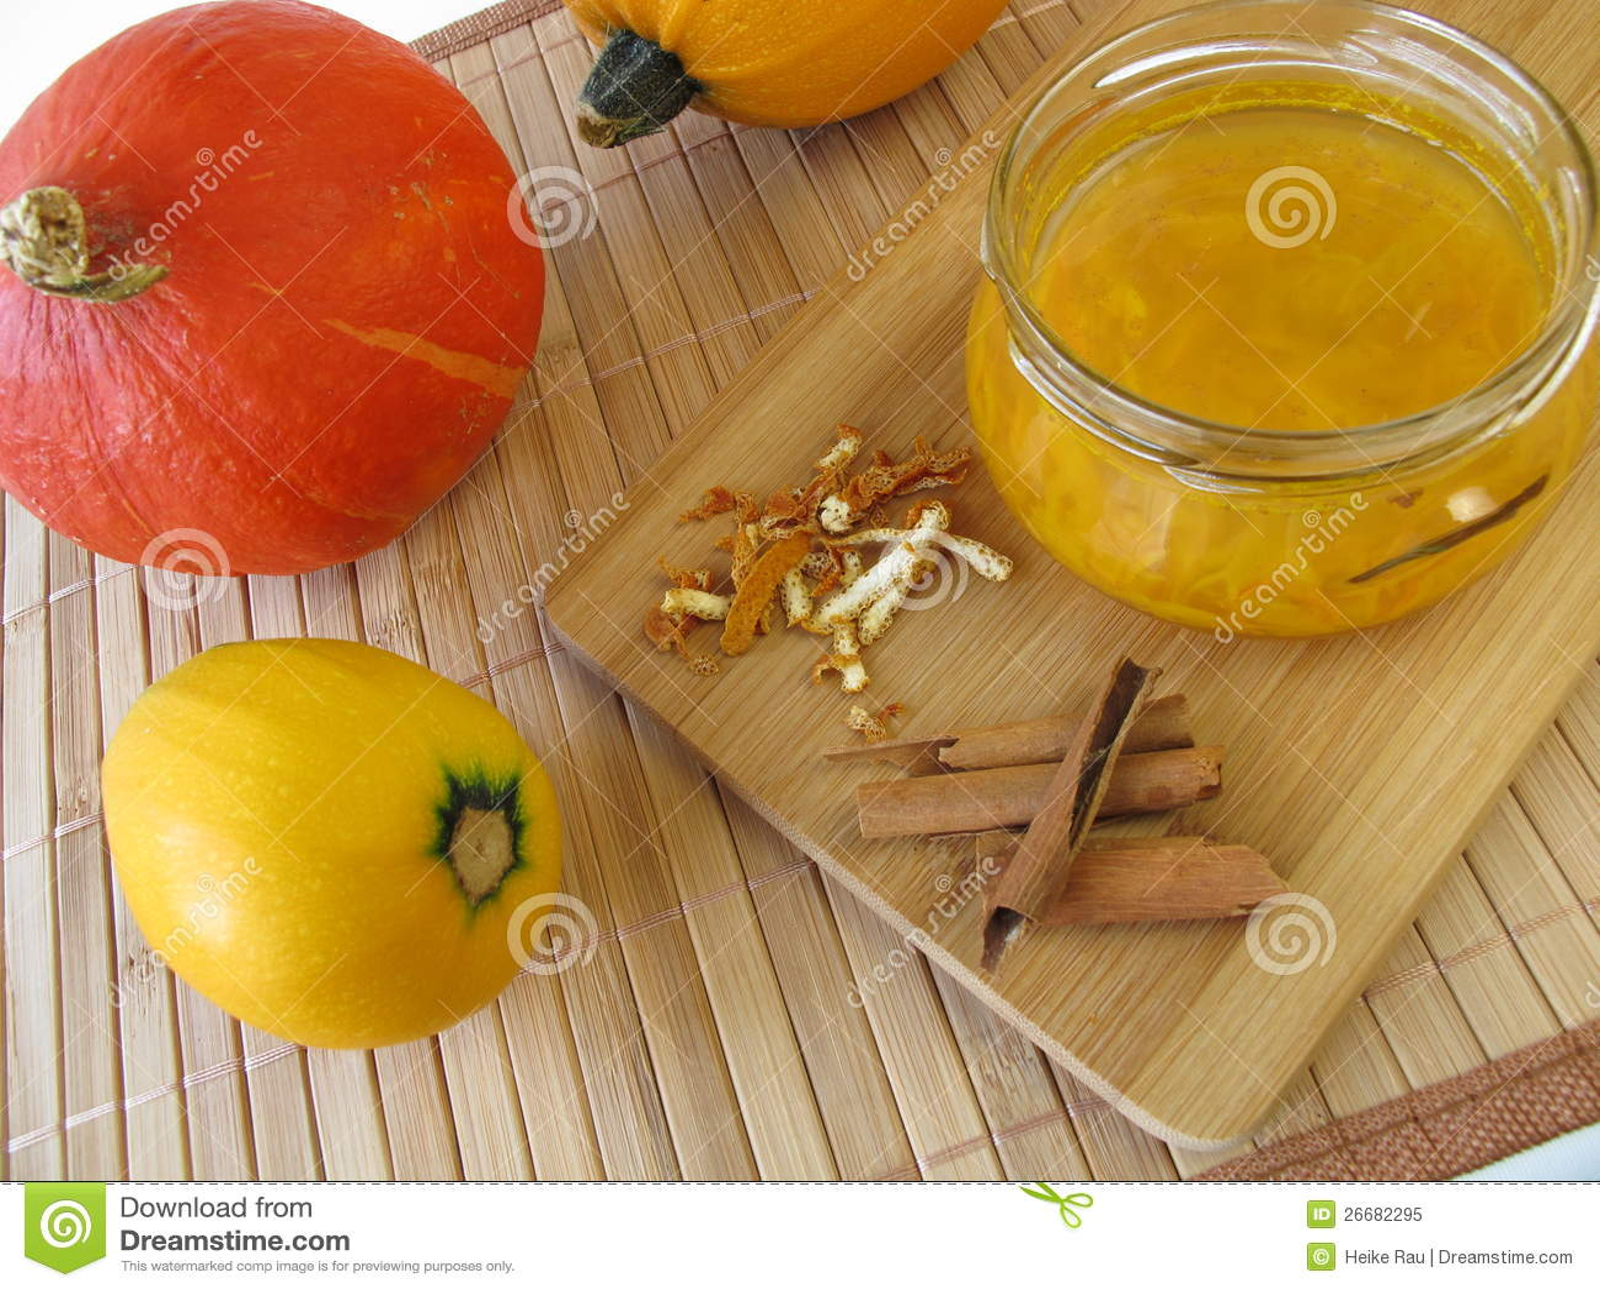 Squash Jam With Cinnamon And Orange Peel Royalty Free Stock Photo ...